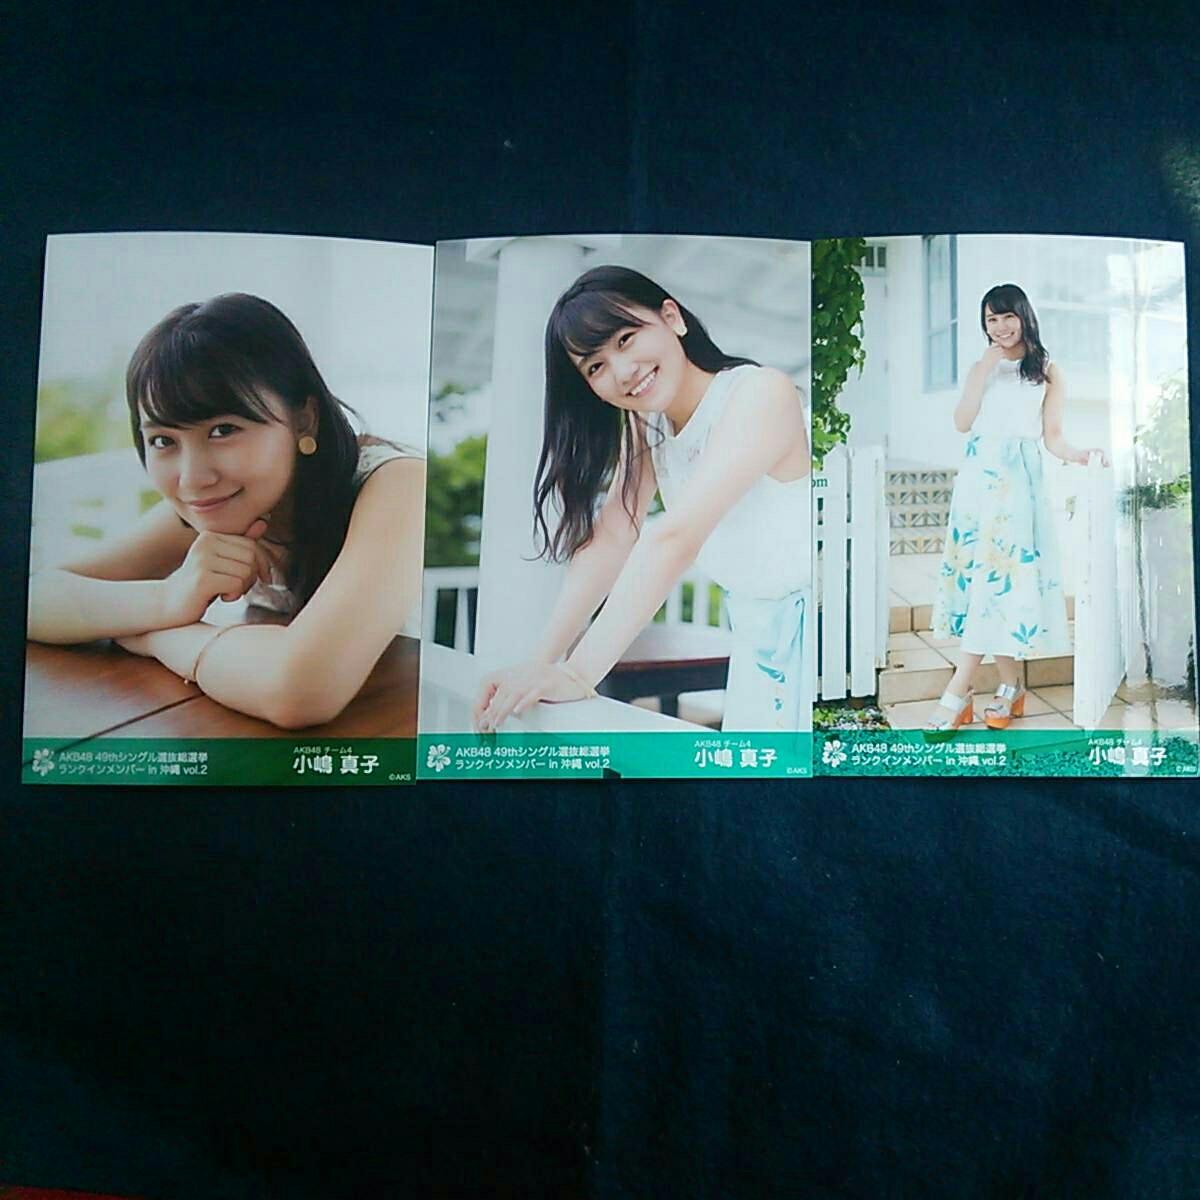 AKB48 49thシングル選抜総選挙 ランクインメンバー in 沖縄 vol.2 小嶋真子 コンプ ライブ・総選挙グッズの画像